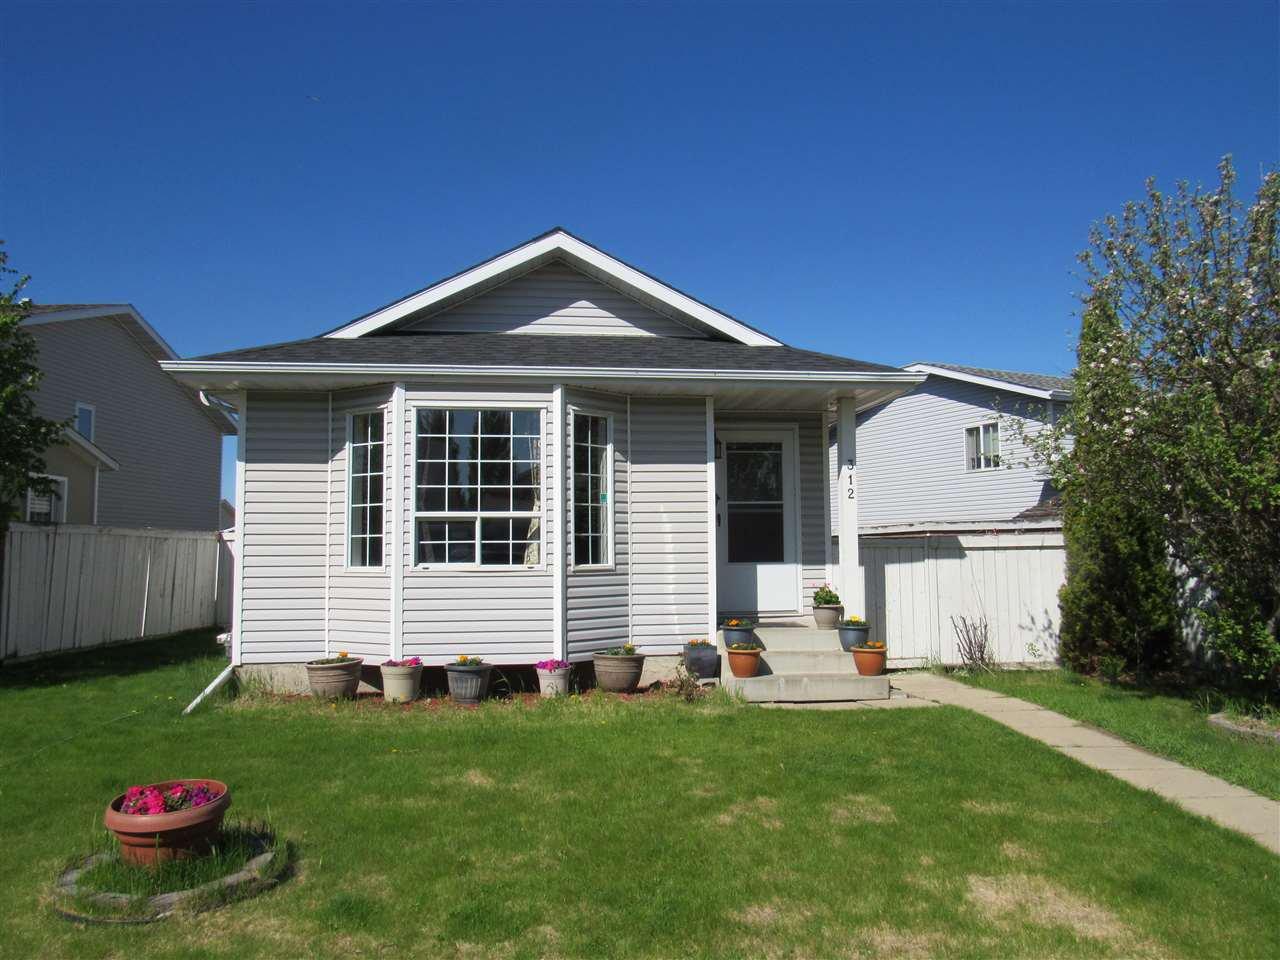 Main Photo: 312 KLINE Crescent in Edmonton: Zone 29 House for sale : MLS®# E4199049